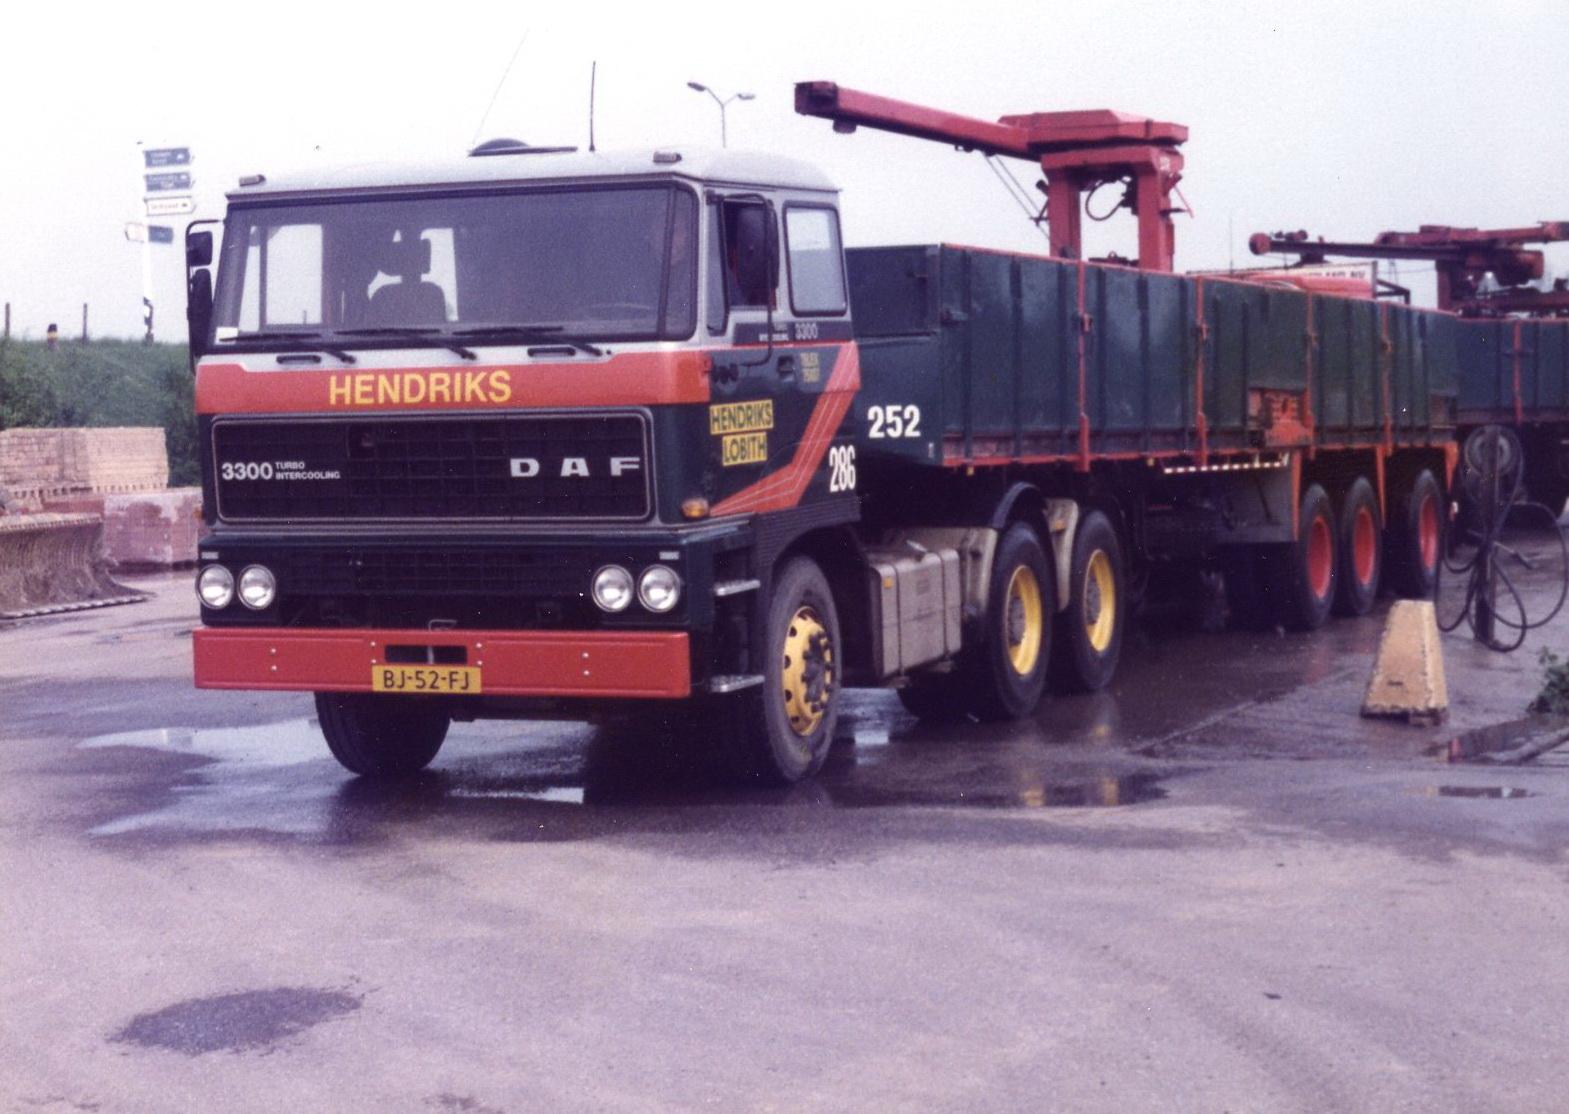 Hendriks-Lobith-DAF-FTT3300-BJ52FJ